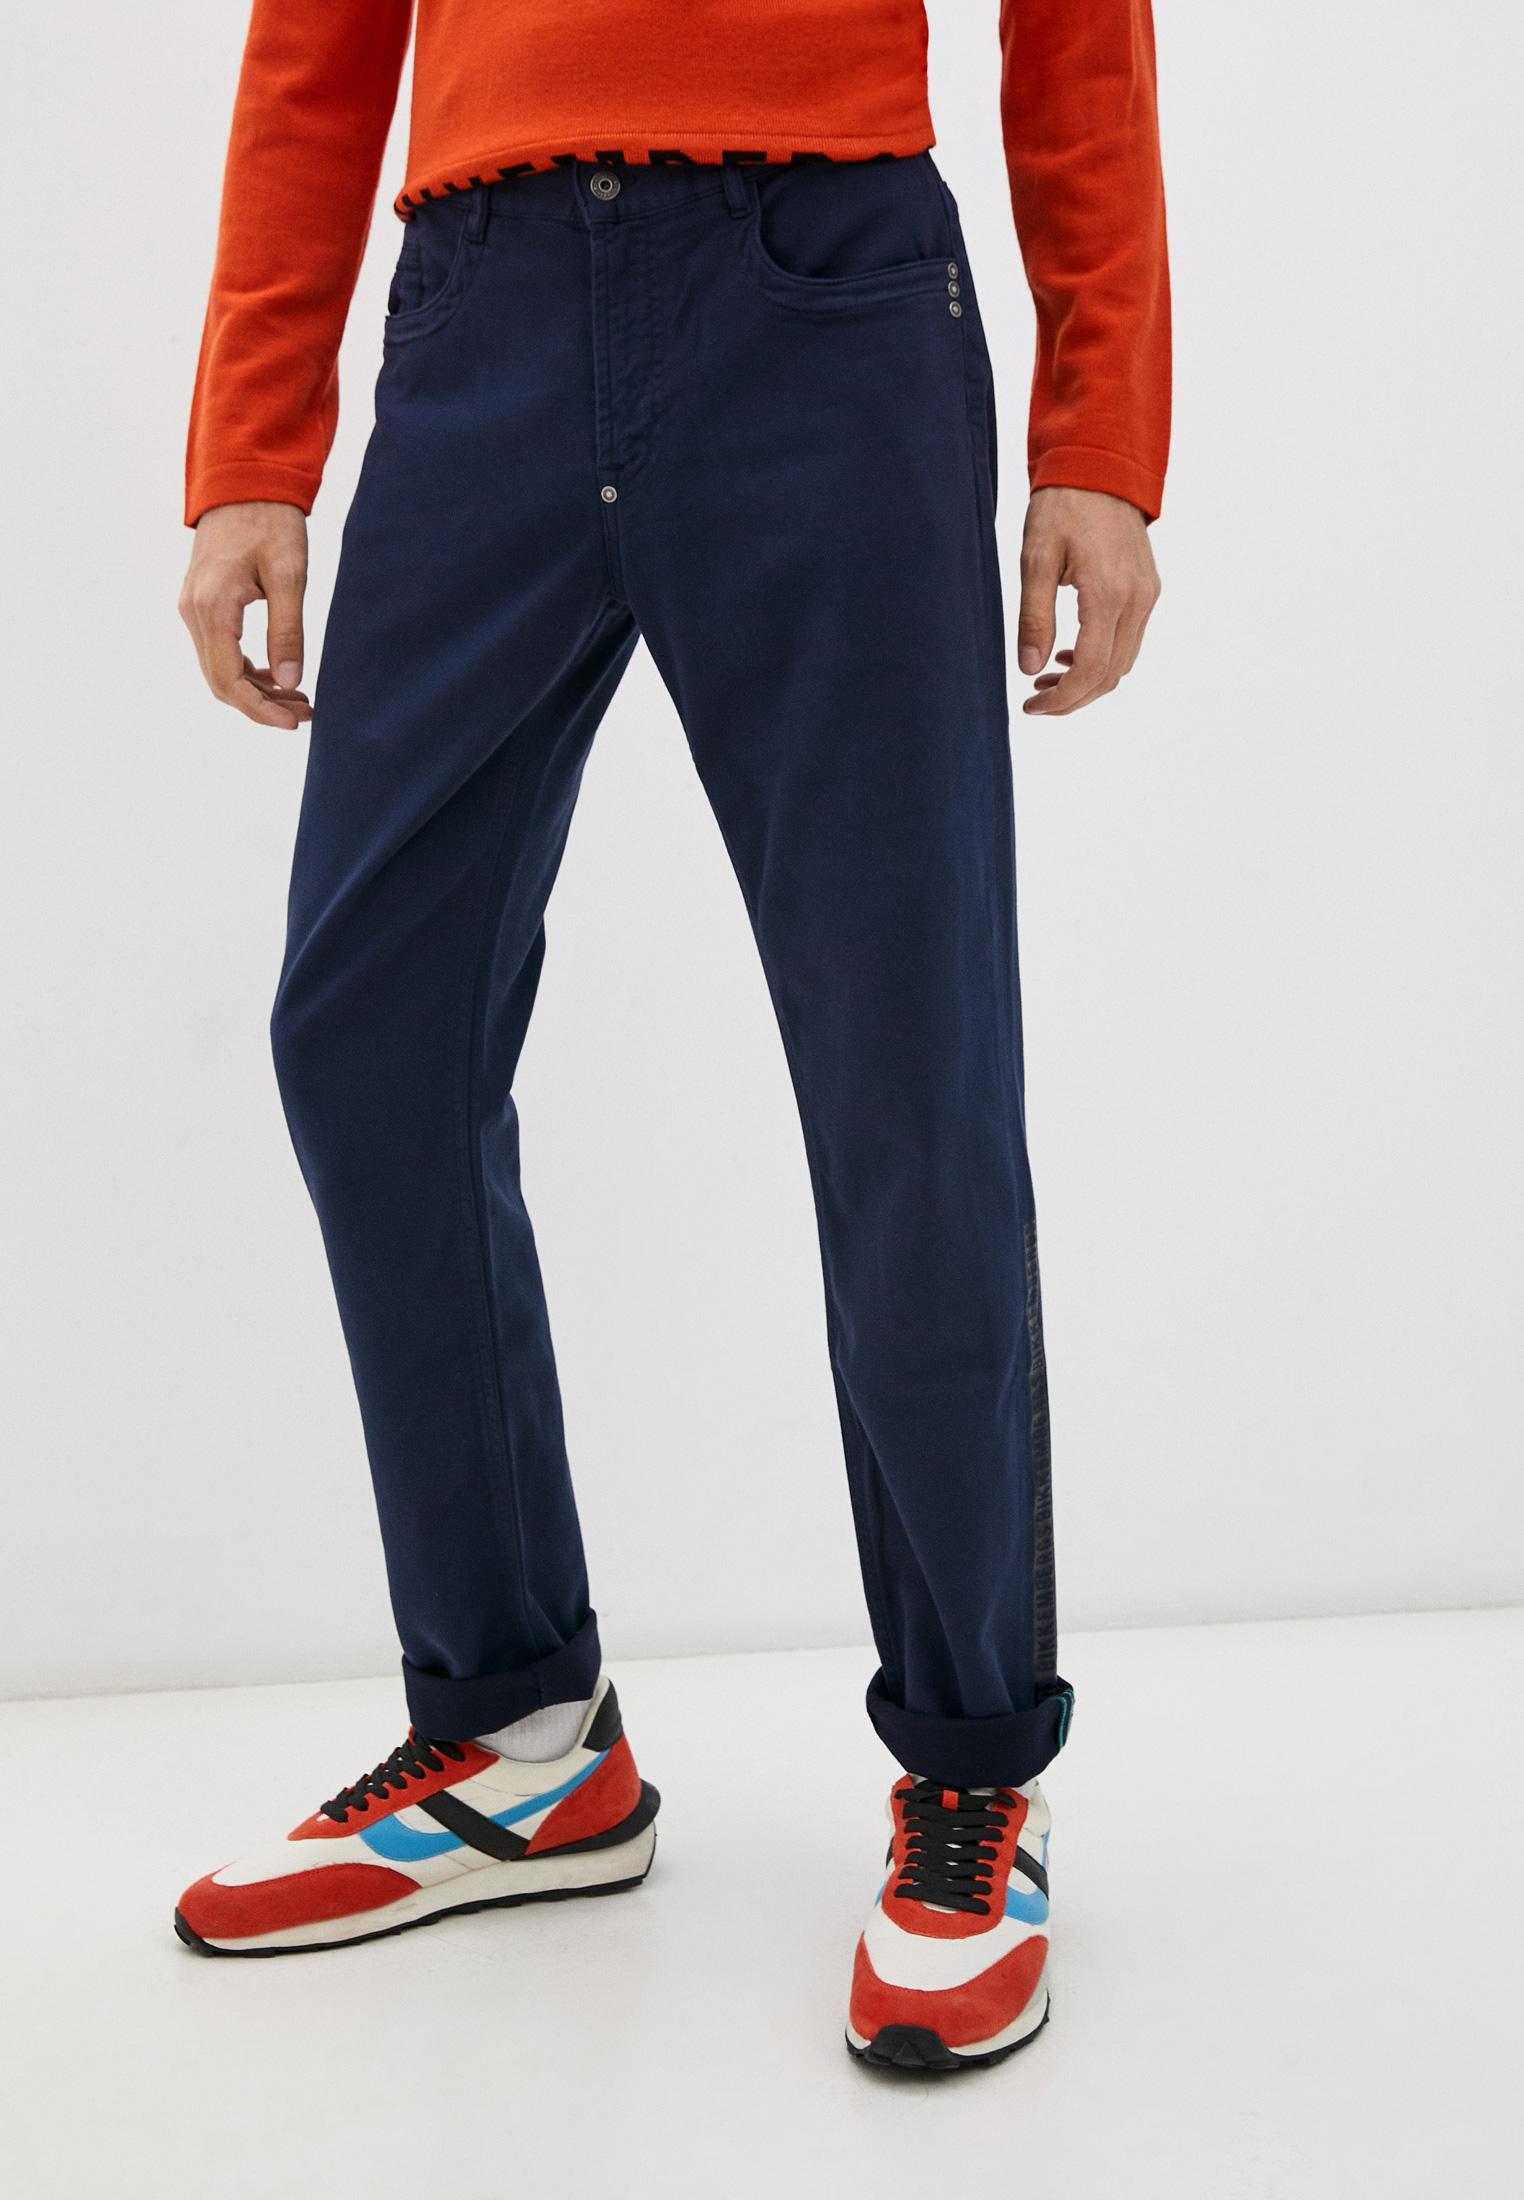 Мужские повседневные брюки Bikkembergs (Биккембергс) C Q 102 14 S 3336